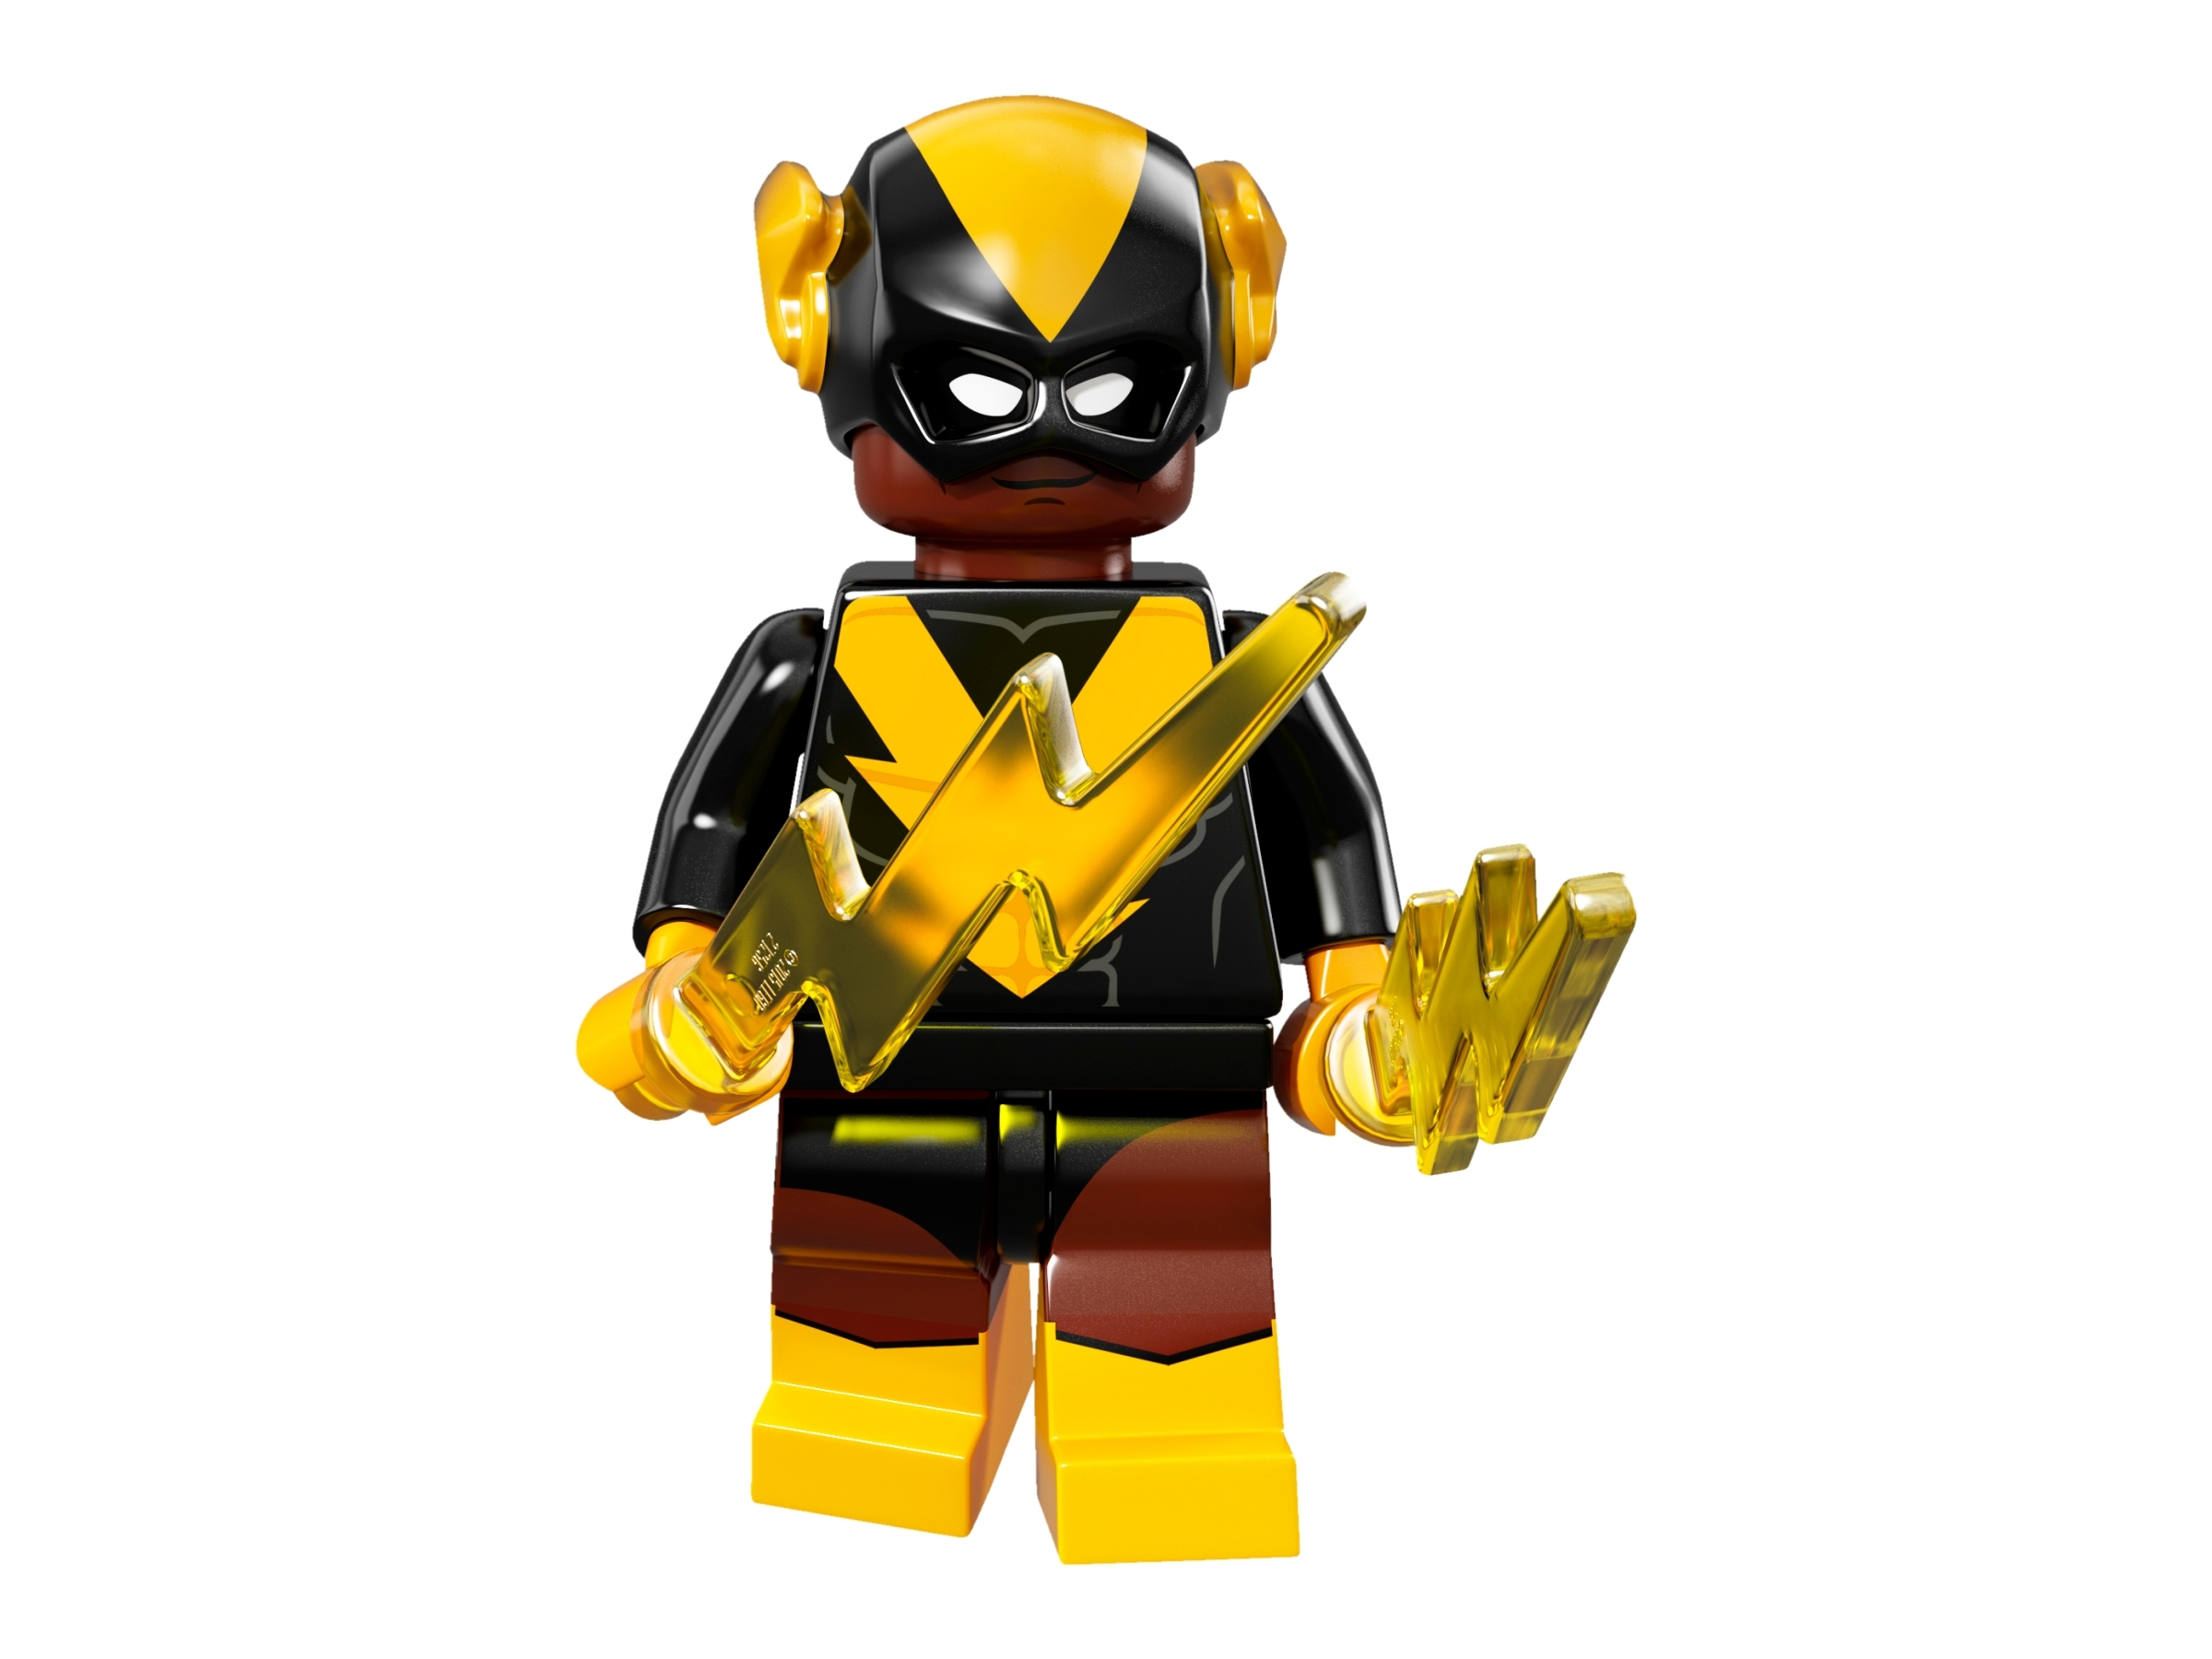 LEGO NEW The LEGO Batman Movie Series 2 Minifig Jor-El 71020